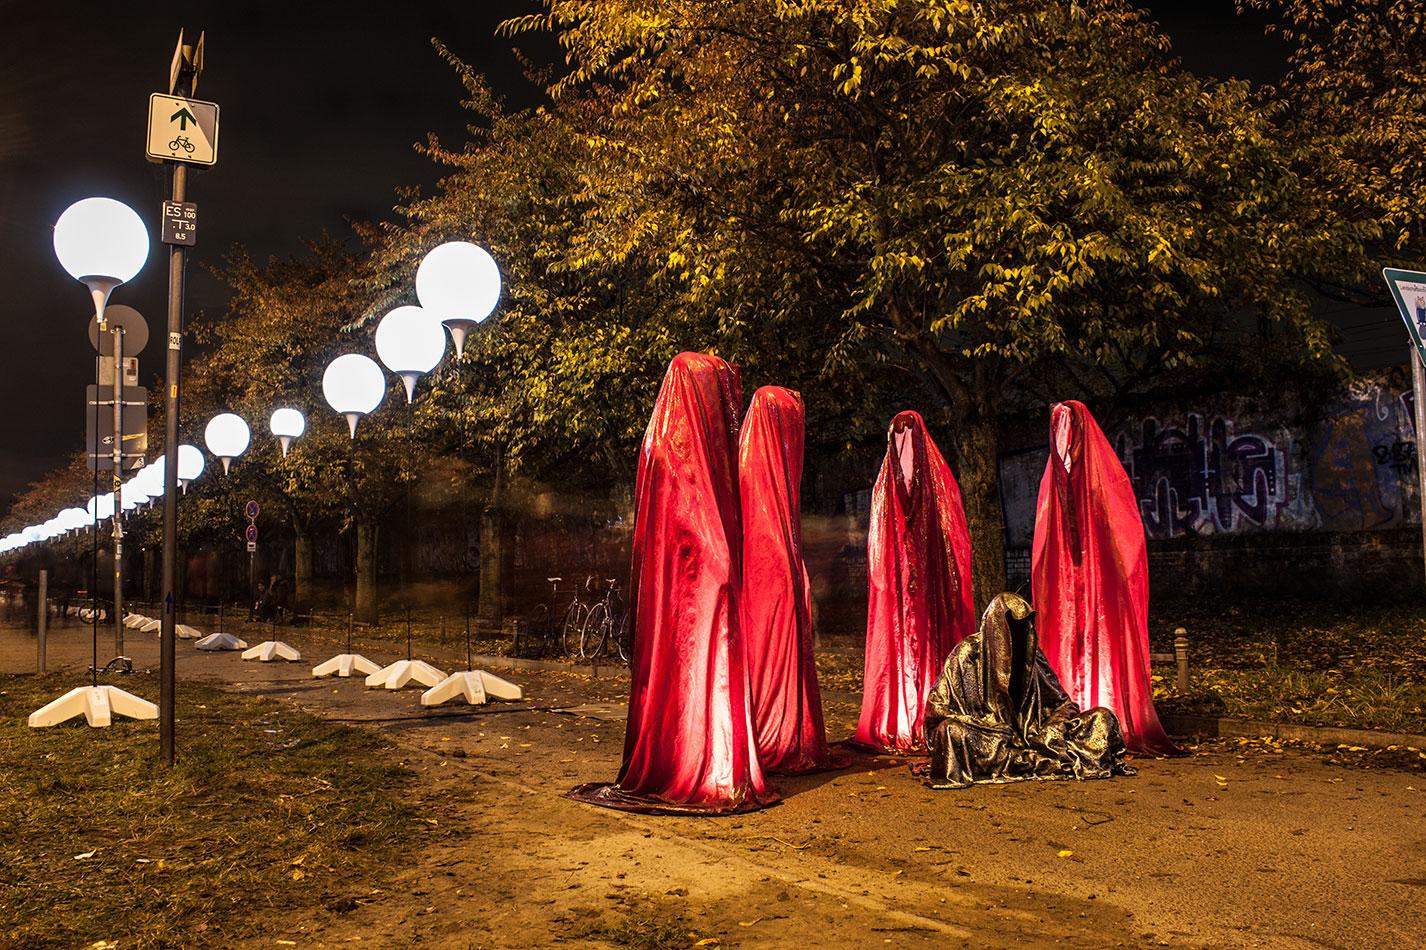 25-jears-wallfall-berlin-germany-contemporary-fine-art-show-arts-design-guardians-of-time-manfred-kili-kielnhofer-4330 - Kopie